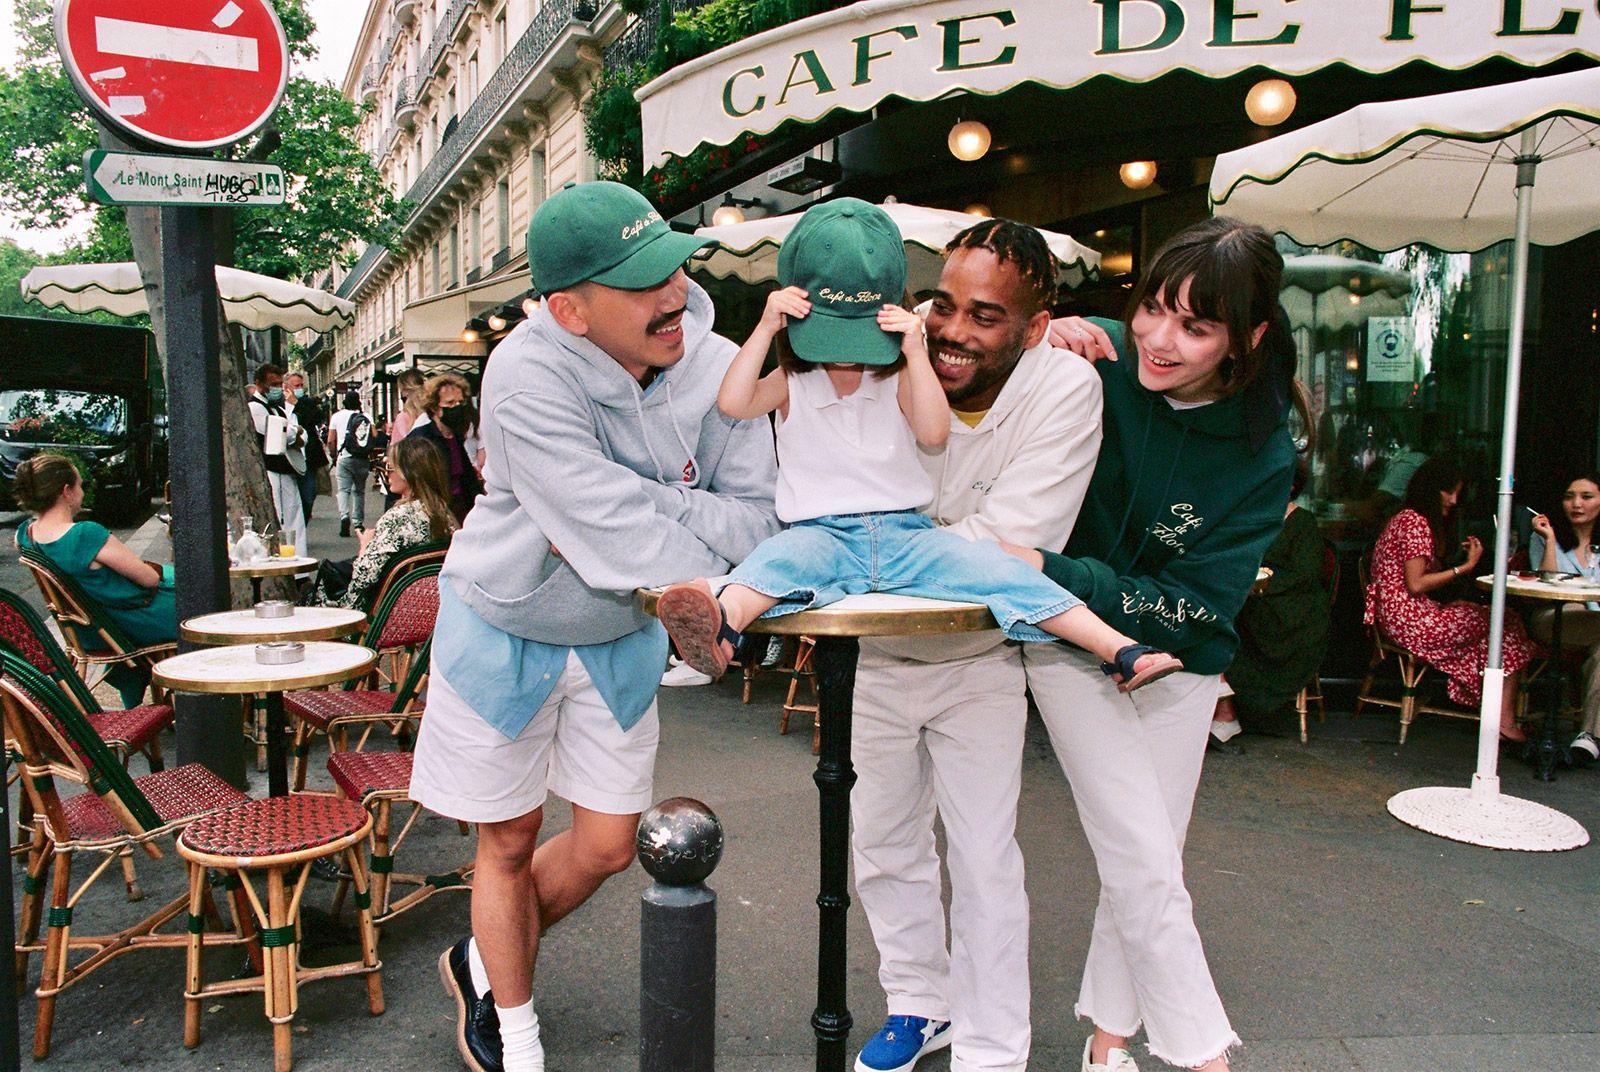 cafe-de-flore-fashion-week-not-in-paris-lookbook-09